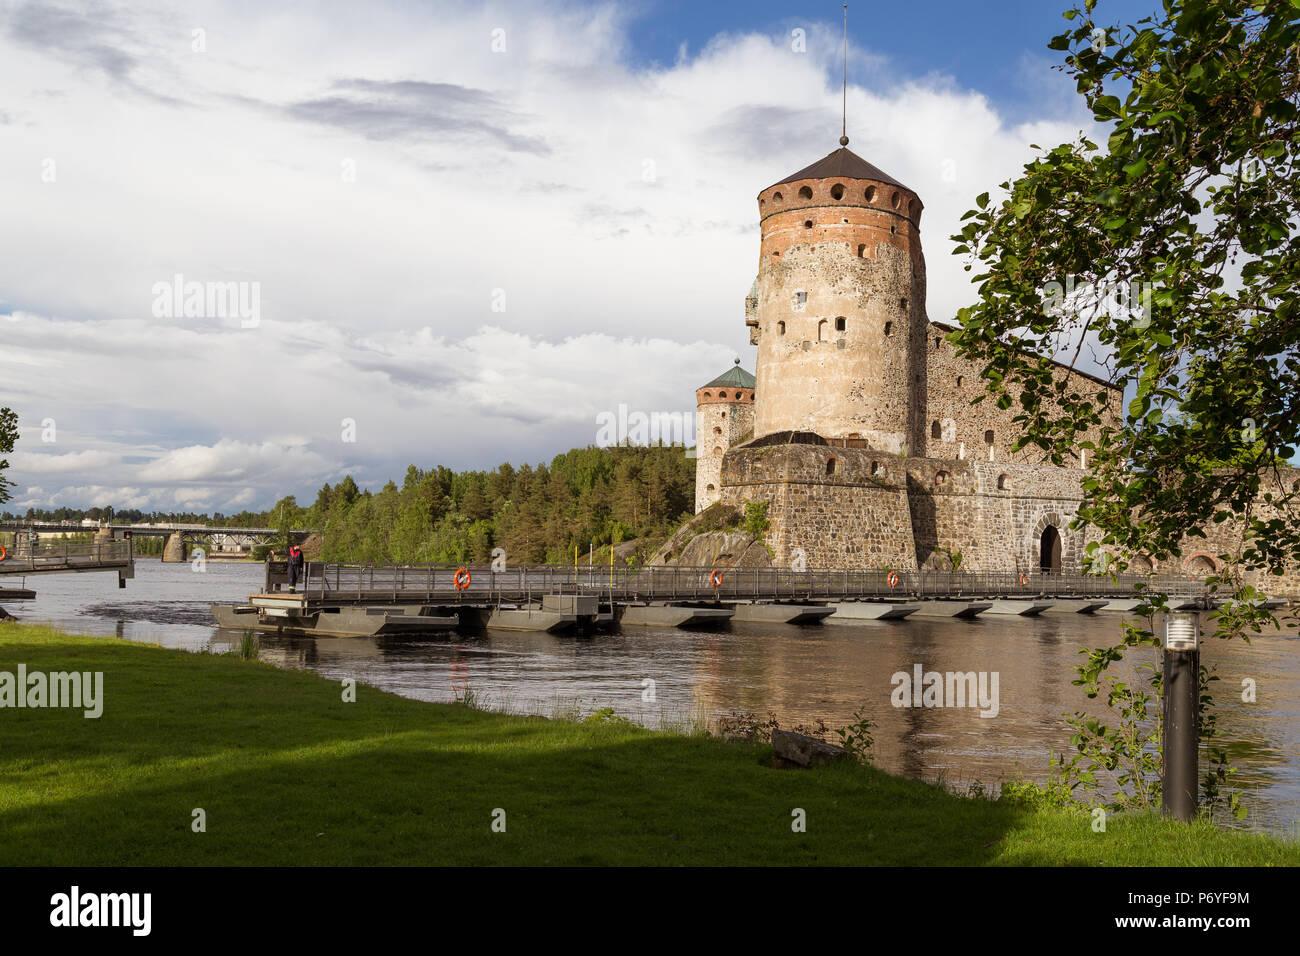 Savon linna caste and moving bridge on summery day - Stock Image